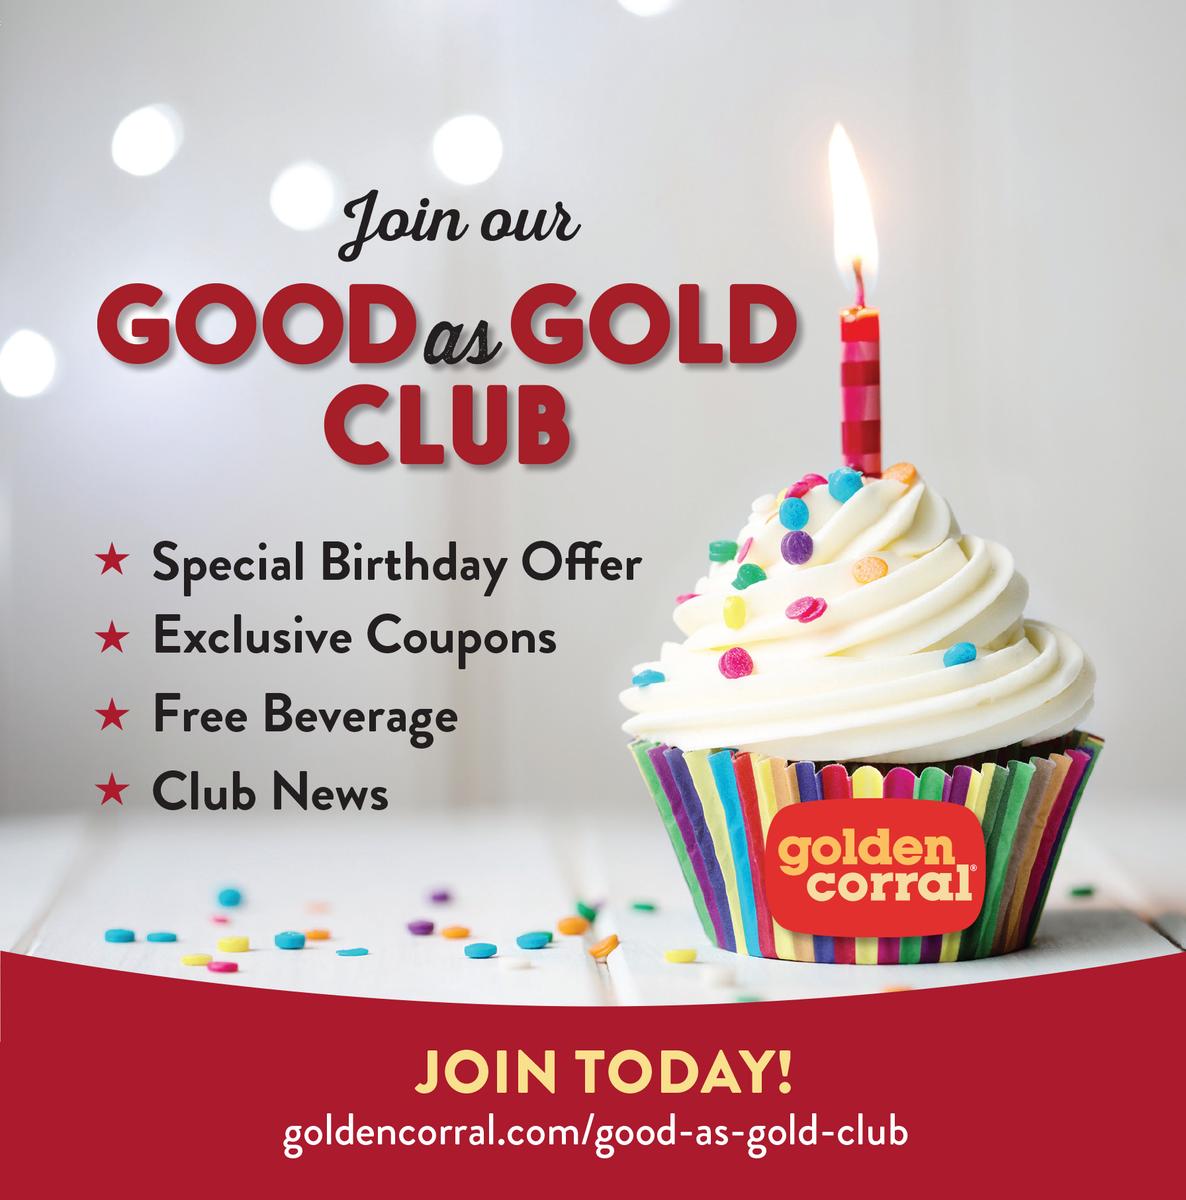 golden corral birthday club Golden Corral on Twitter: